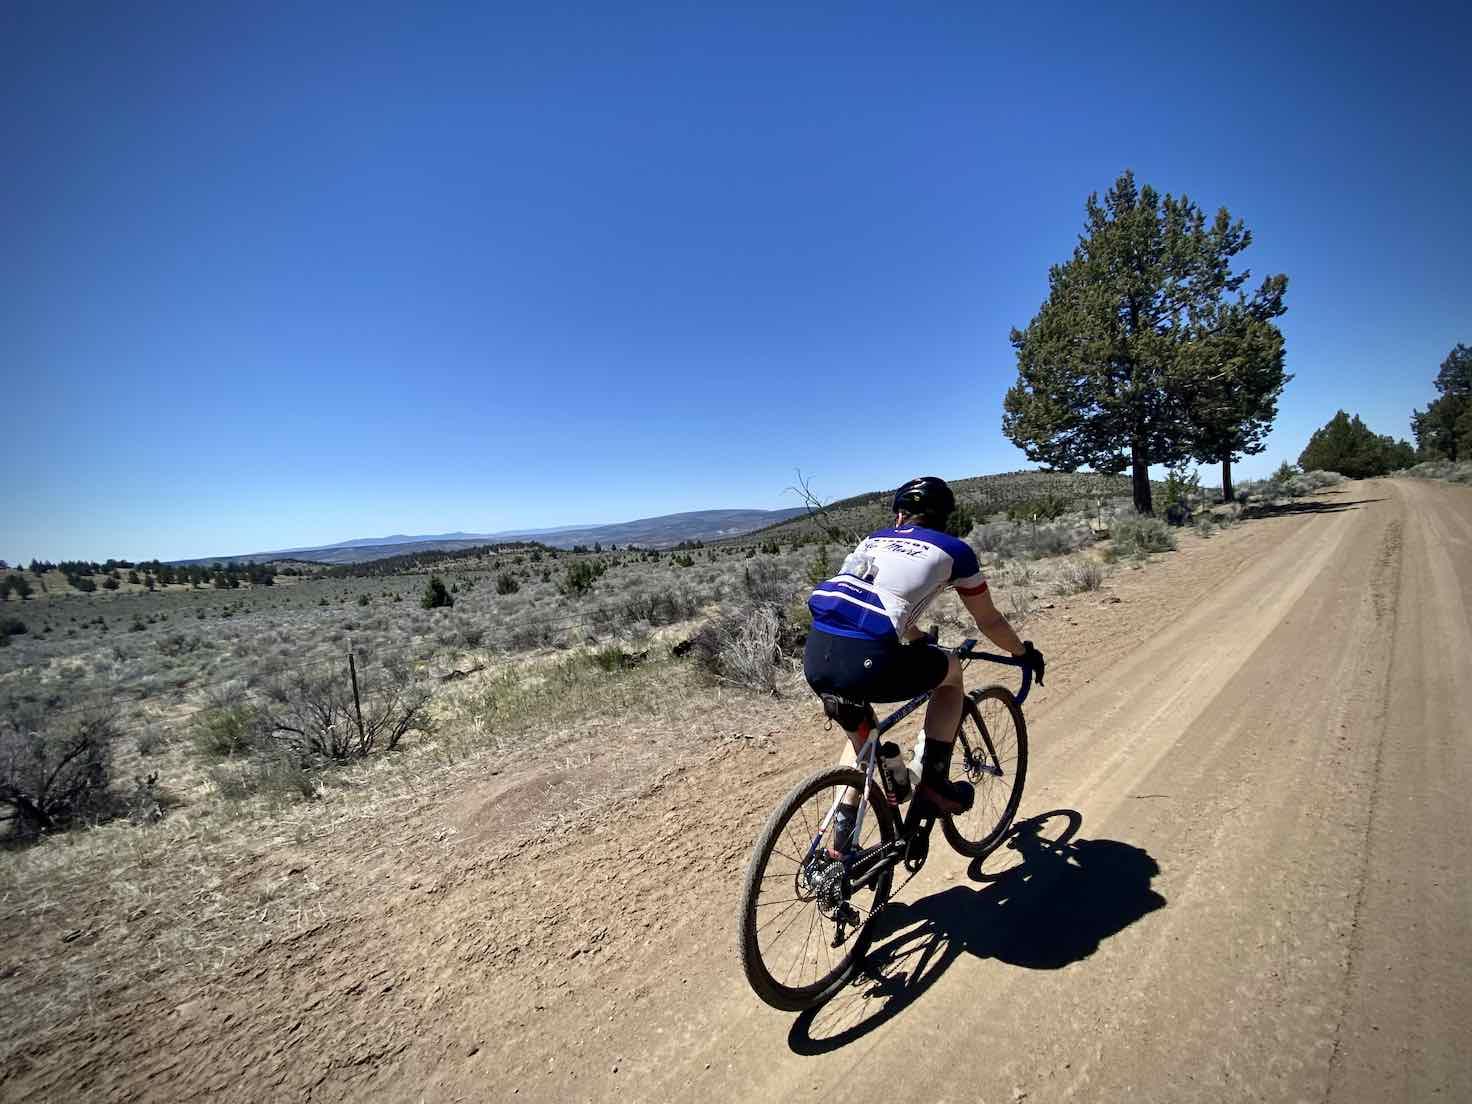 Cyclist riding the ridge with big views along Roberts Road.